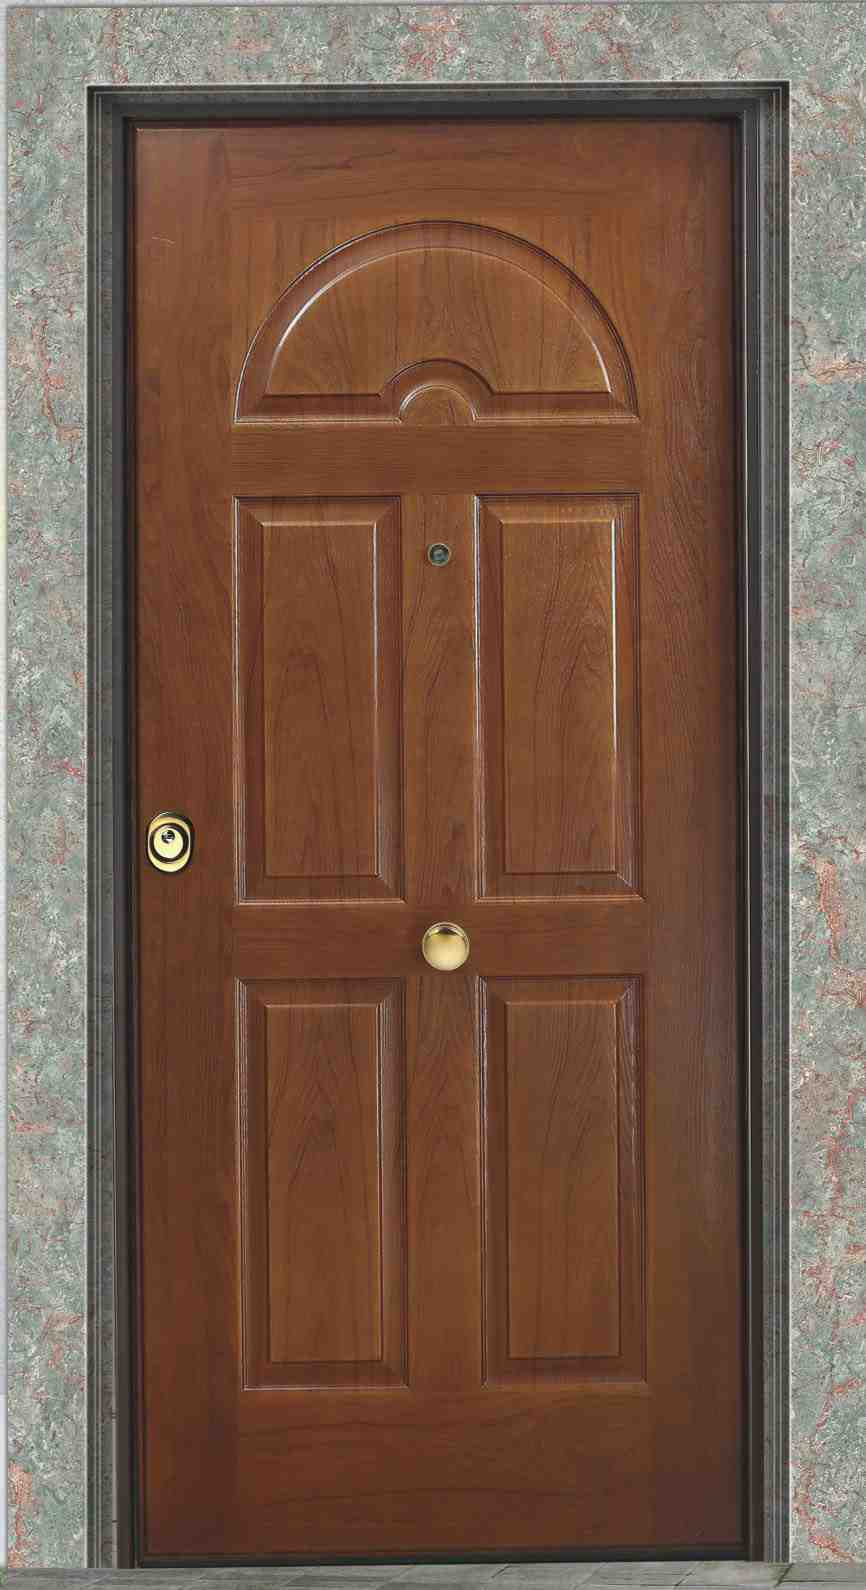 Porte blindate classe 4 da 360 porta blindata classe 4 - Porta blindata classe 4 ...